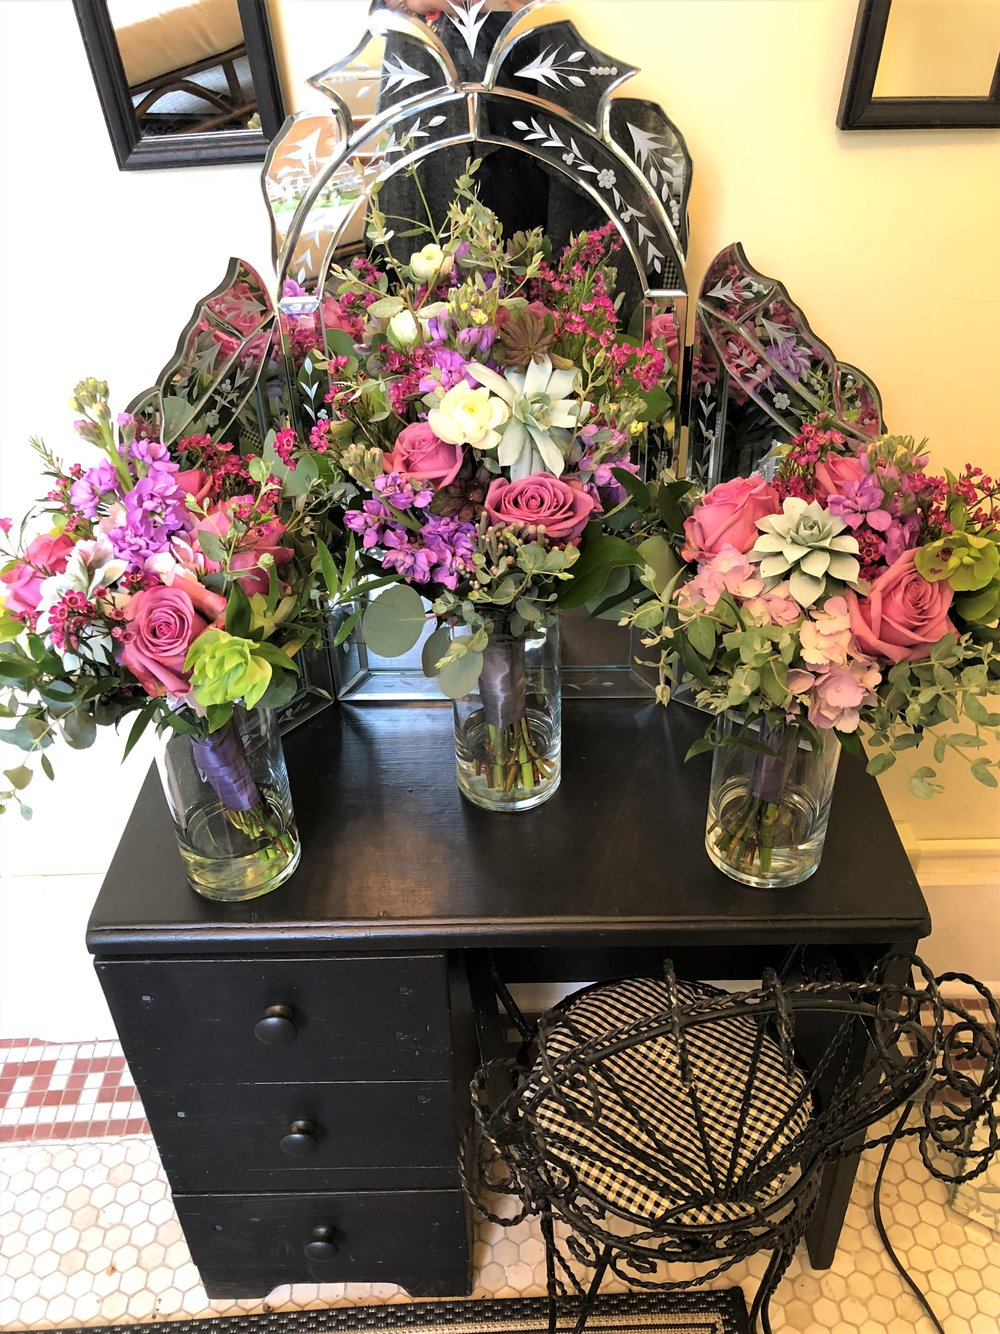 2018.05.19 Lefler Kasebier Wdg The Hall at Castle Inn DWG Bridal Suite Bridesmaids Bouquets 2.jpg